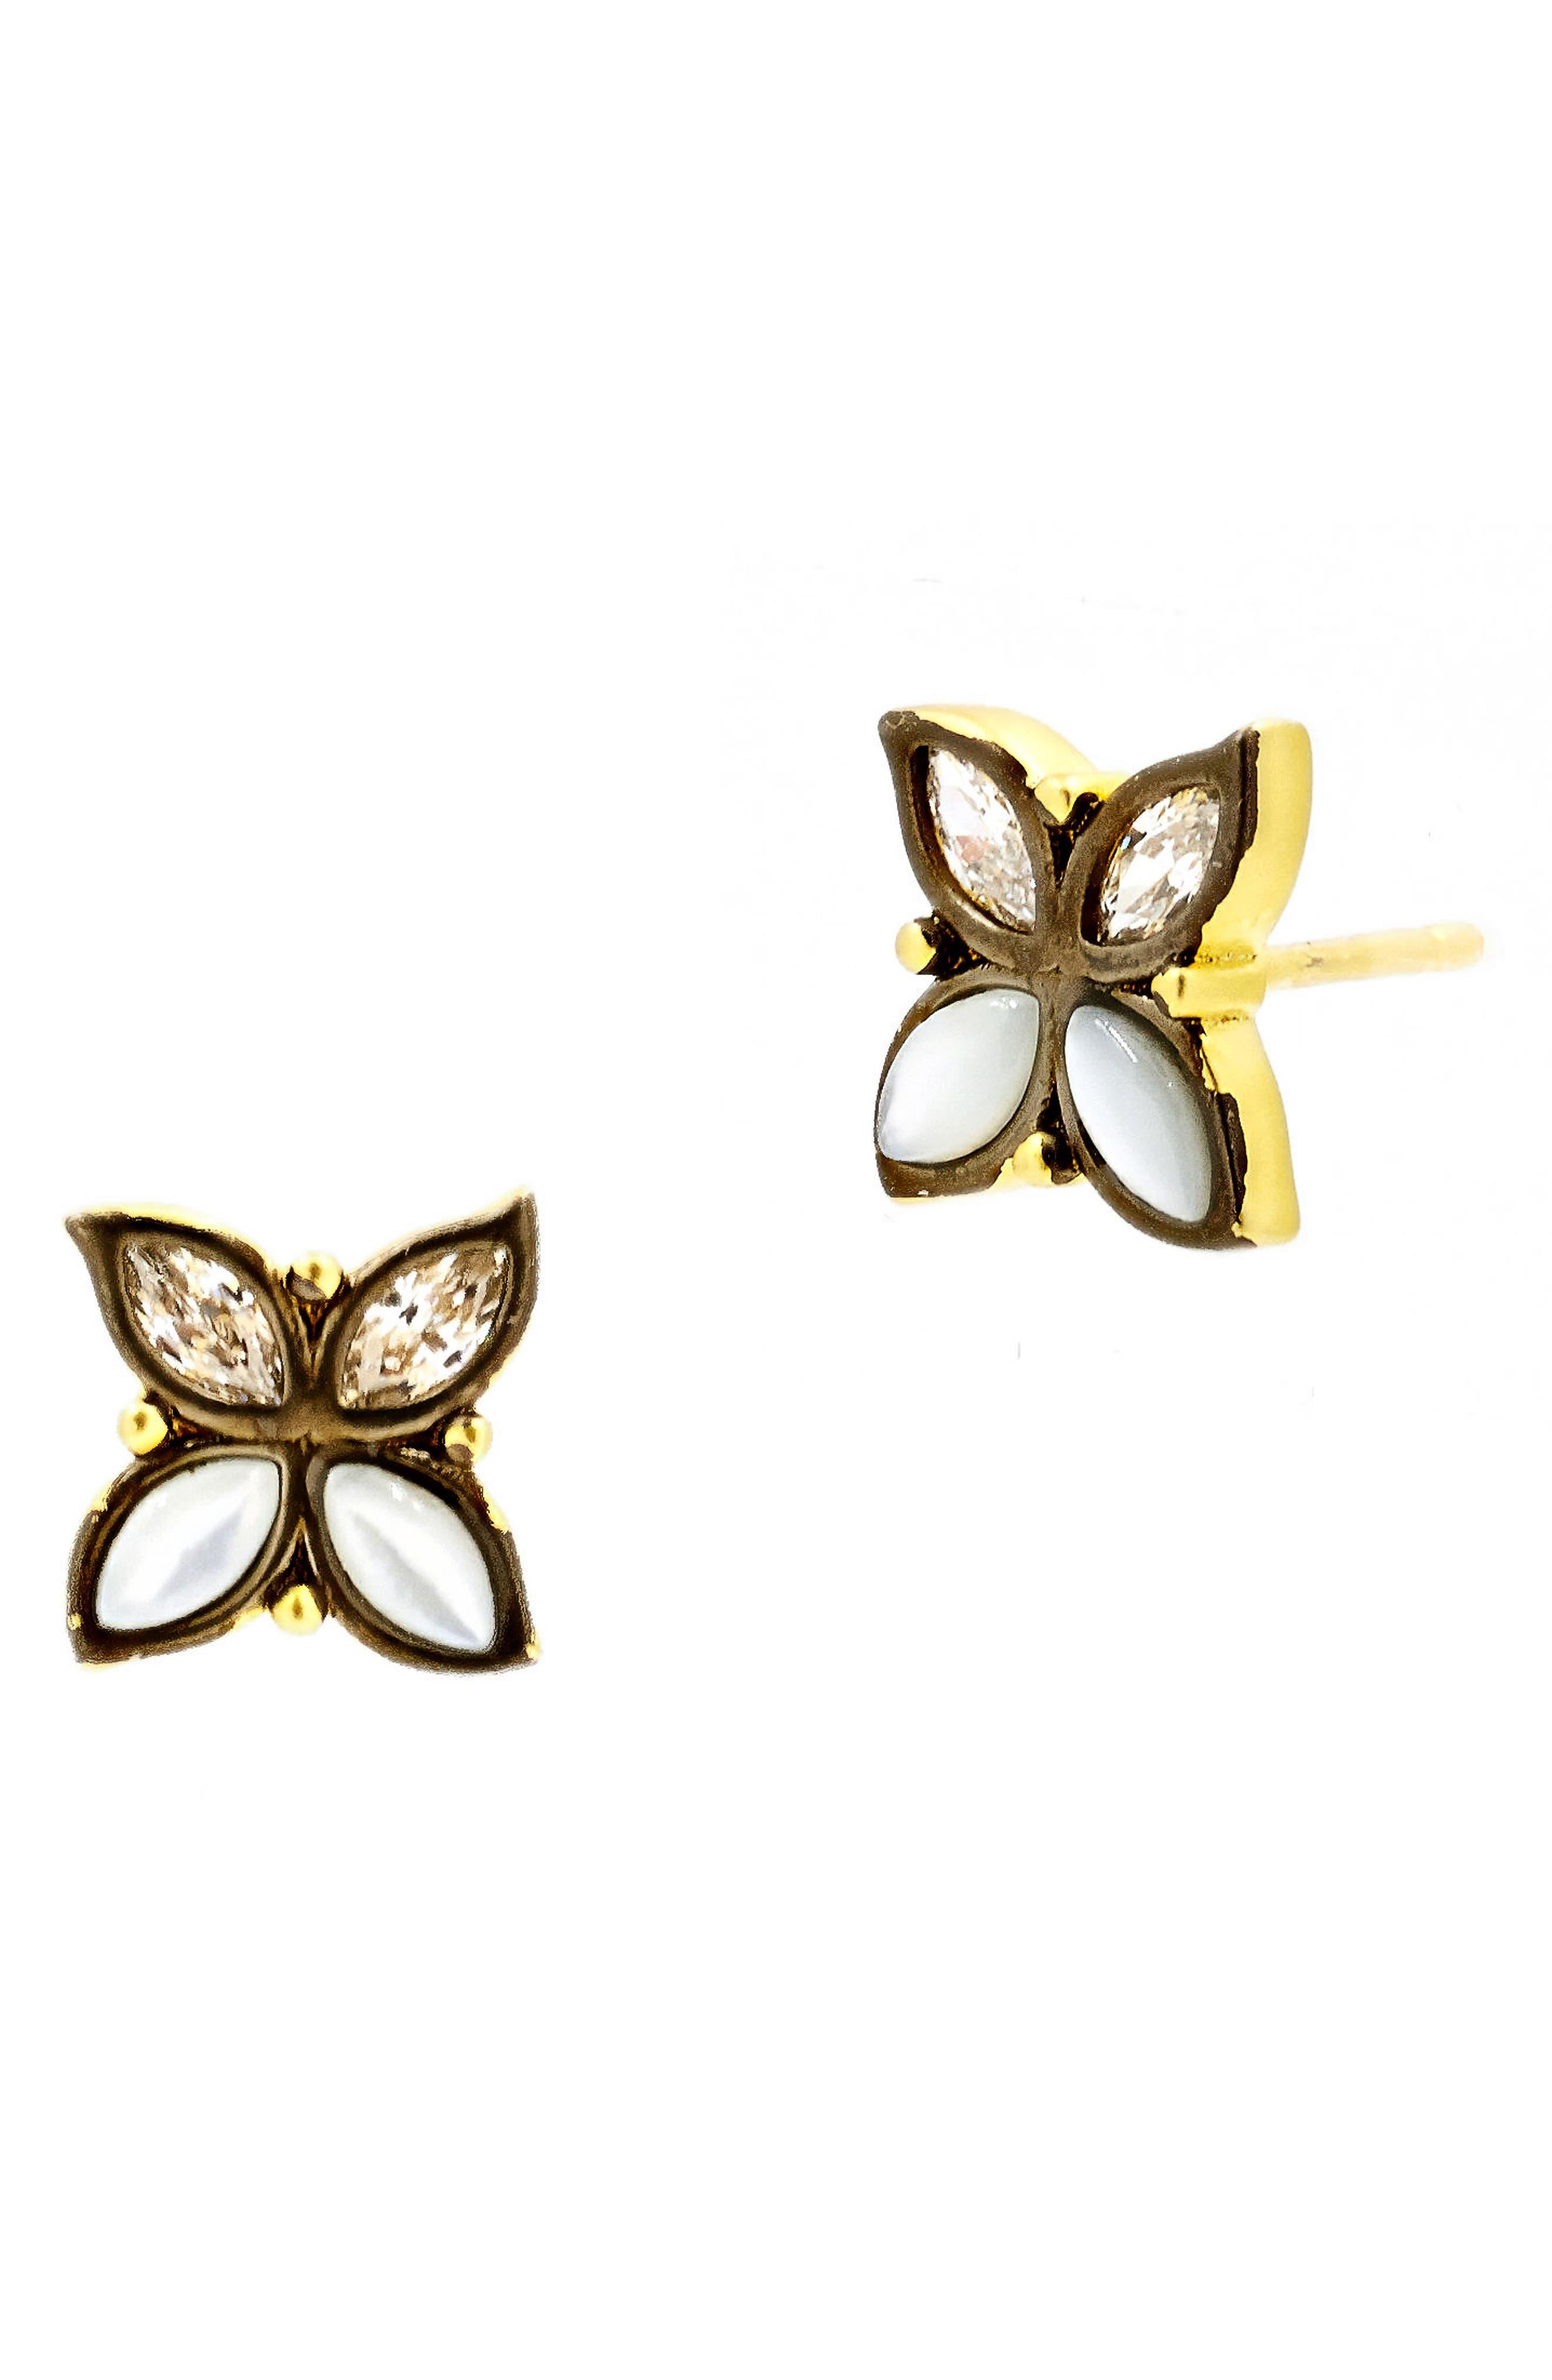 Fleur Bloom Stud Earrings,                             Main thumbnail 1, color,                             GOLD/ BLACK RHODIUM